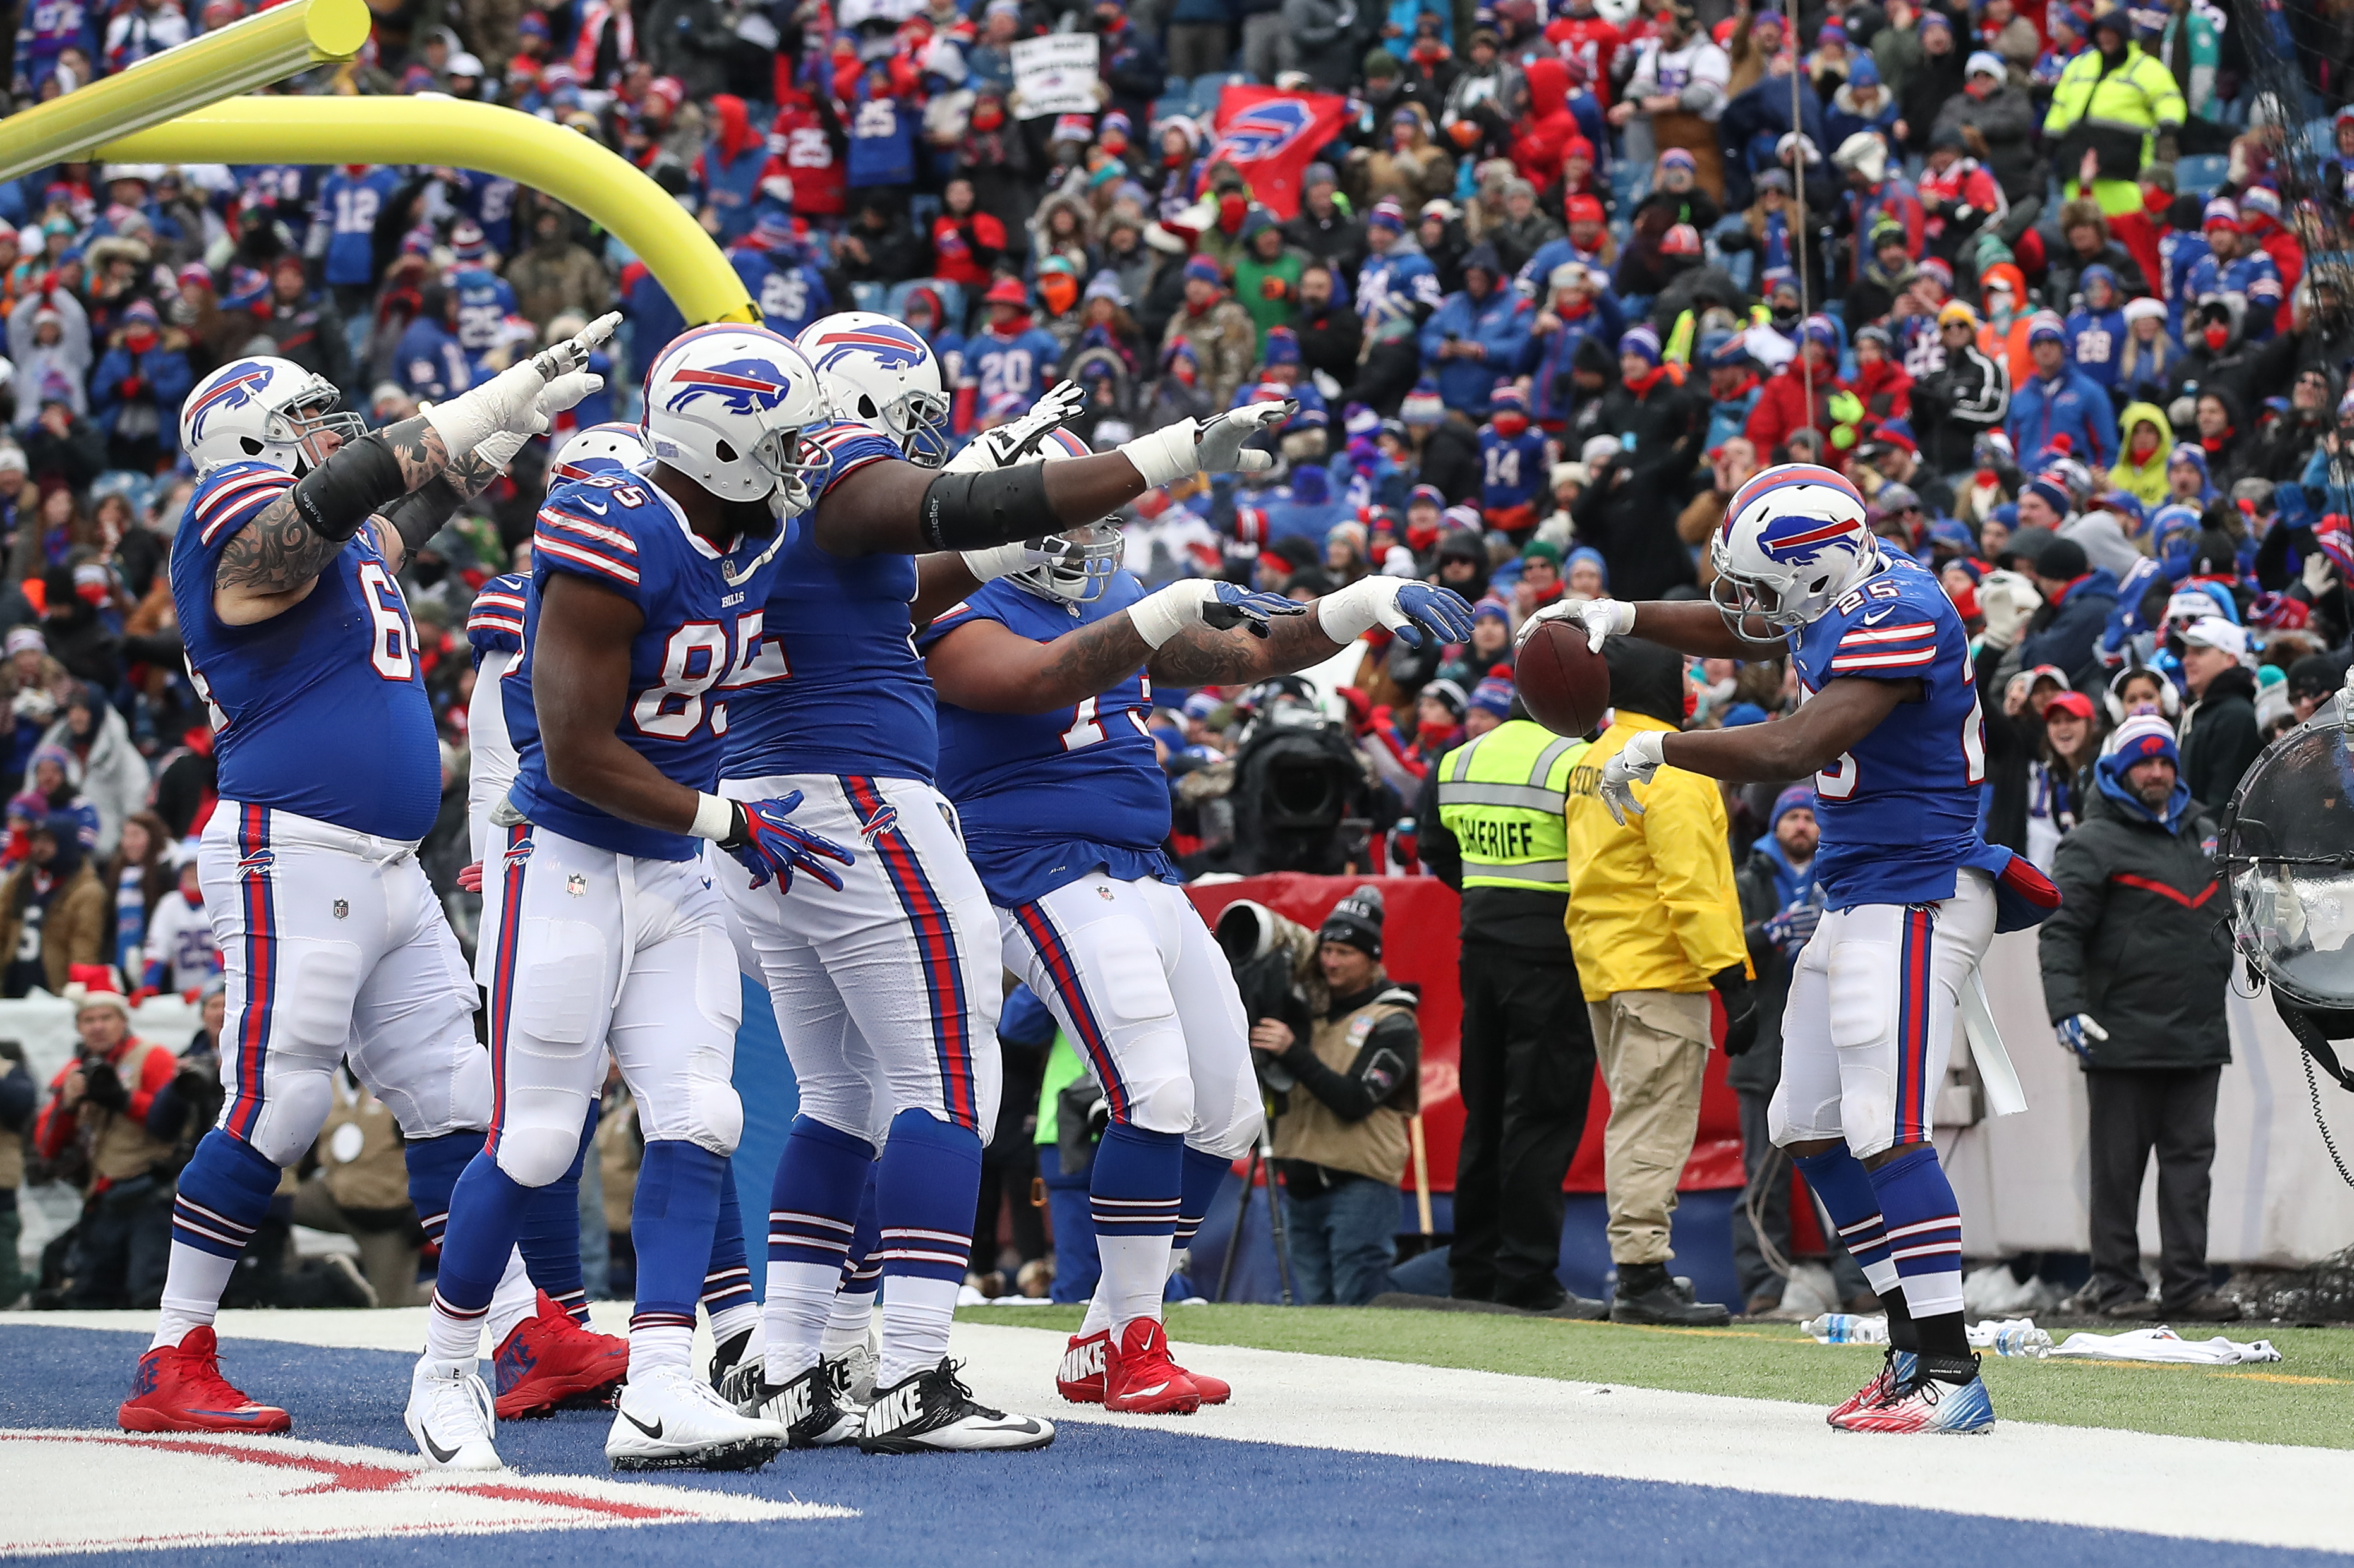 Richie Incognito, Buffalo Bills, Cortar Cabeza Padre, NFL